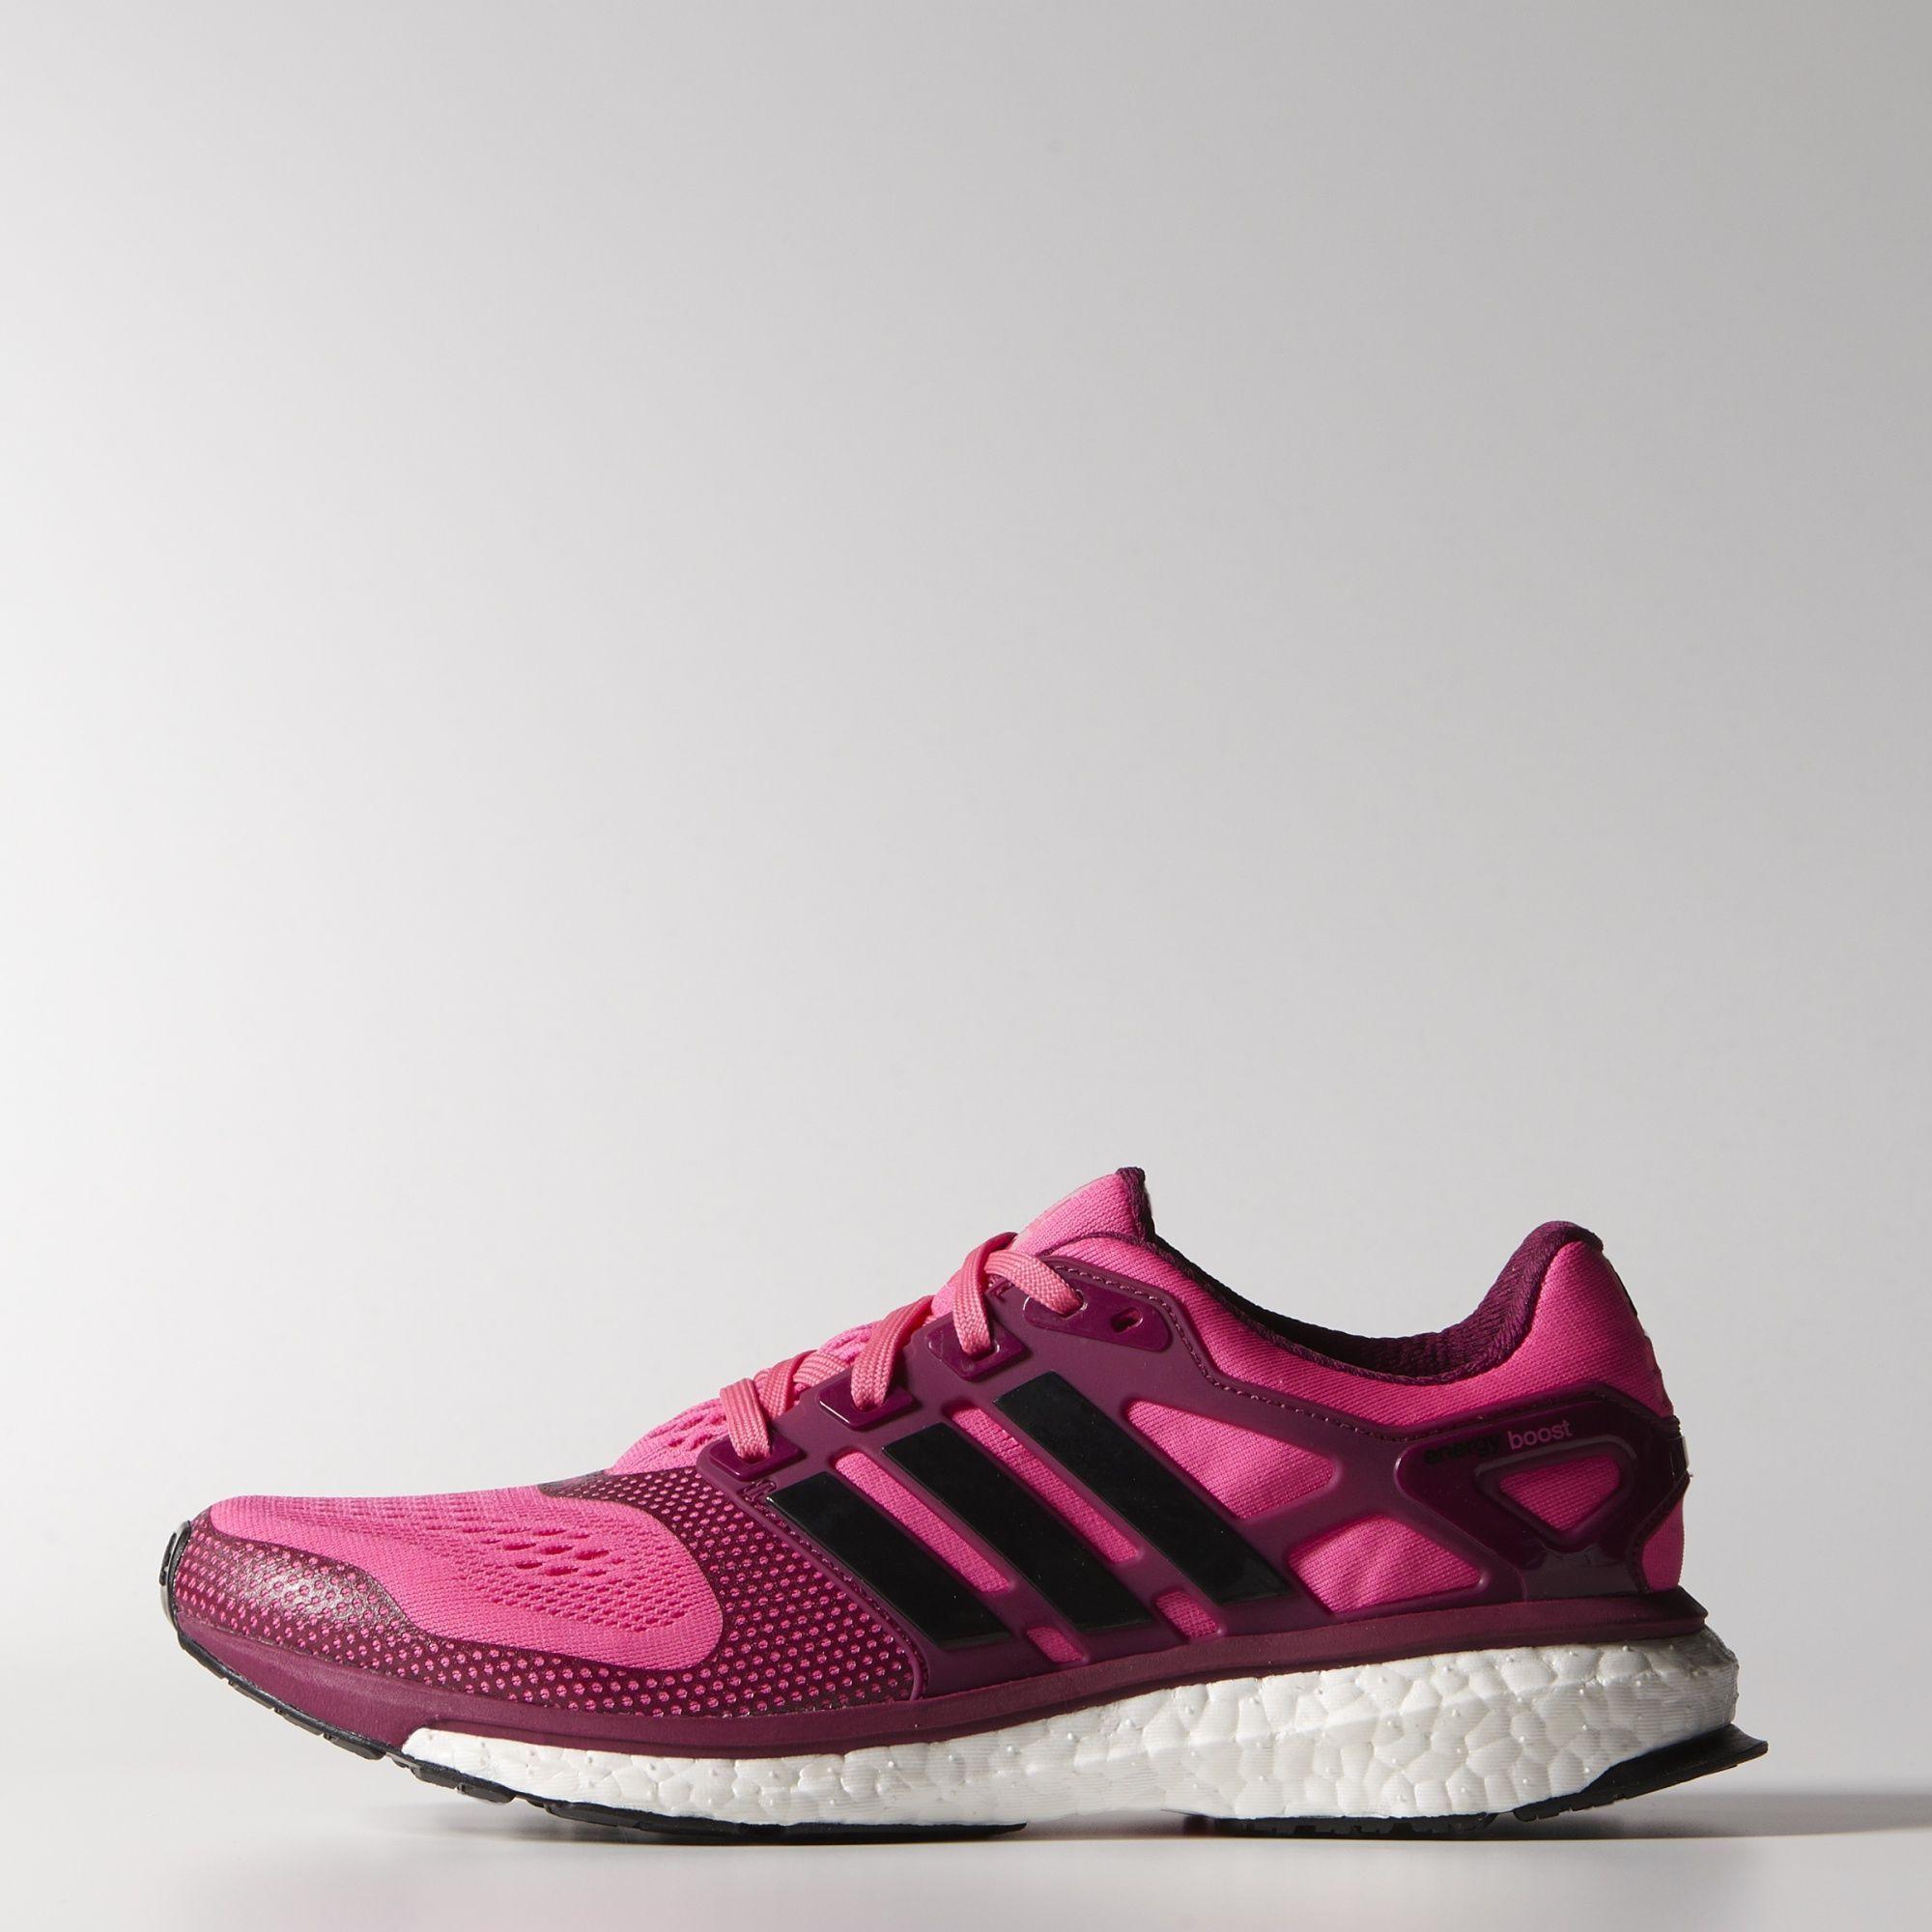 adidas energy boost 2.0 esm running shoes black